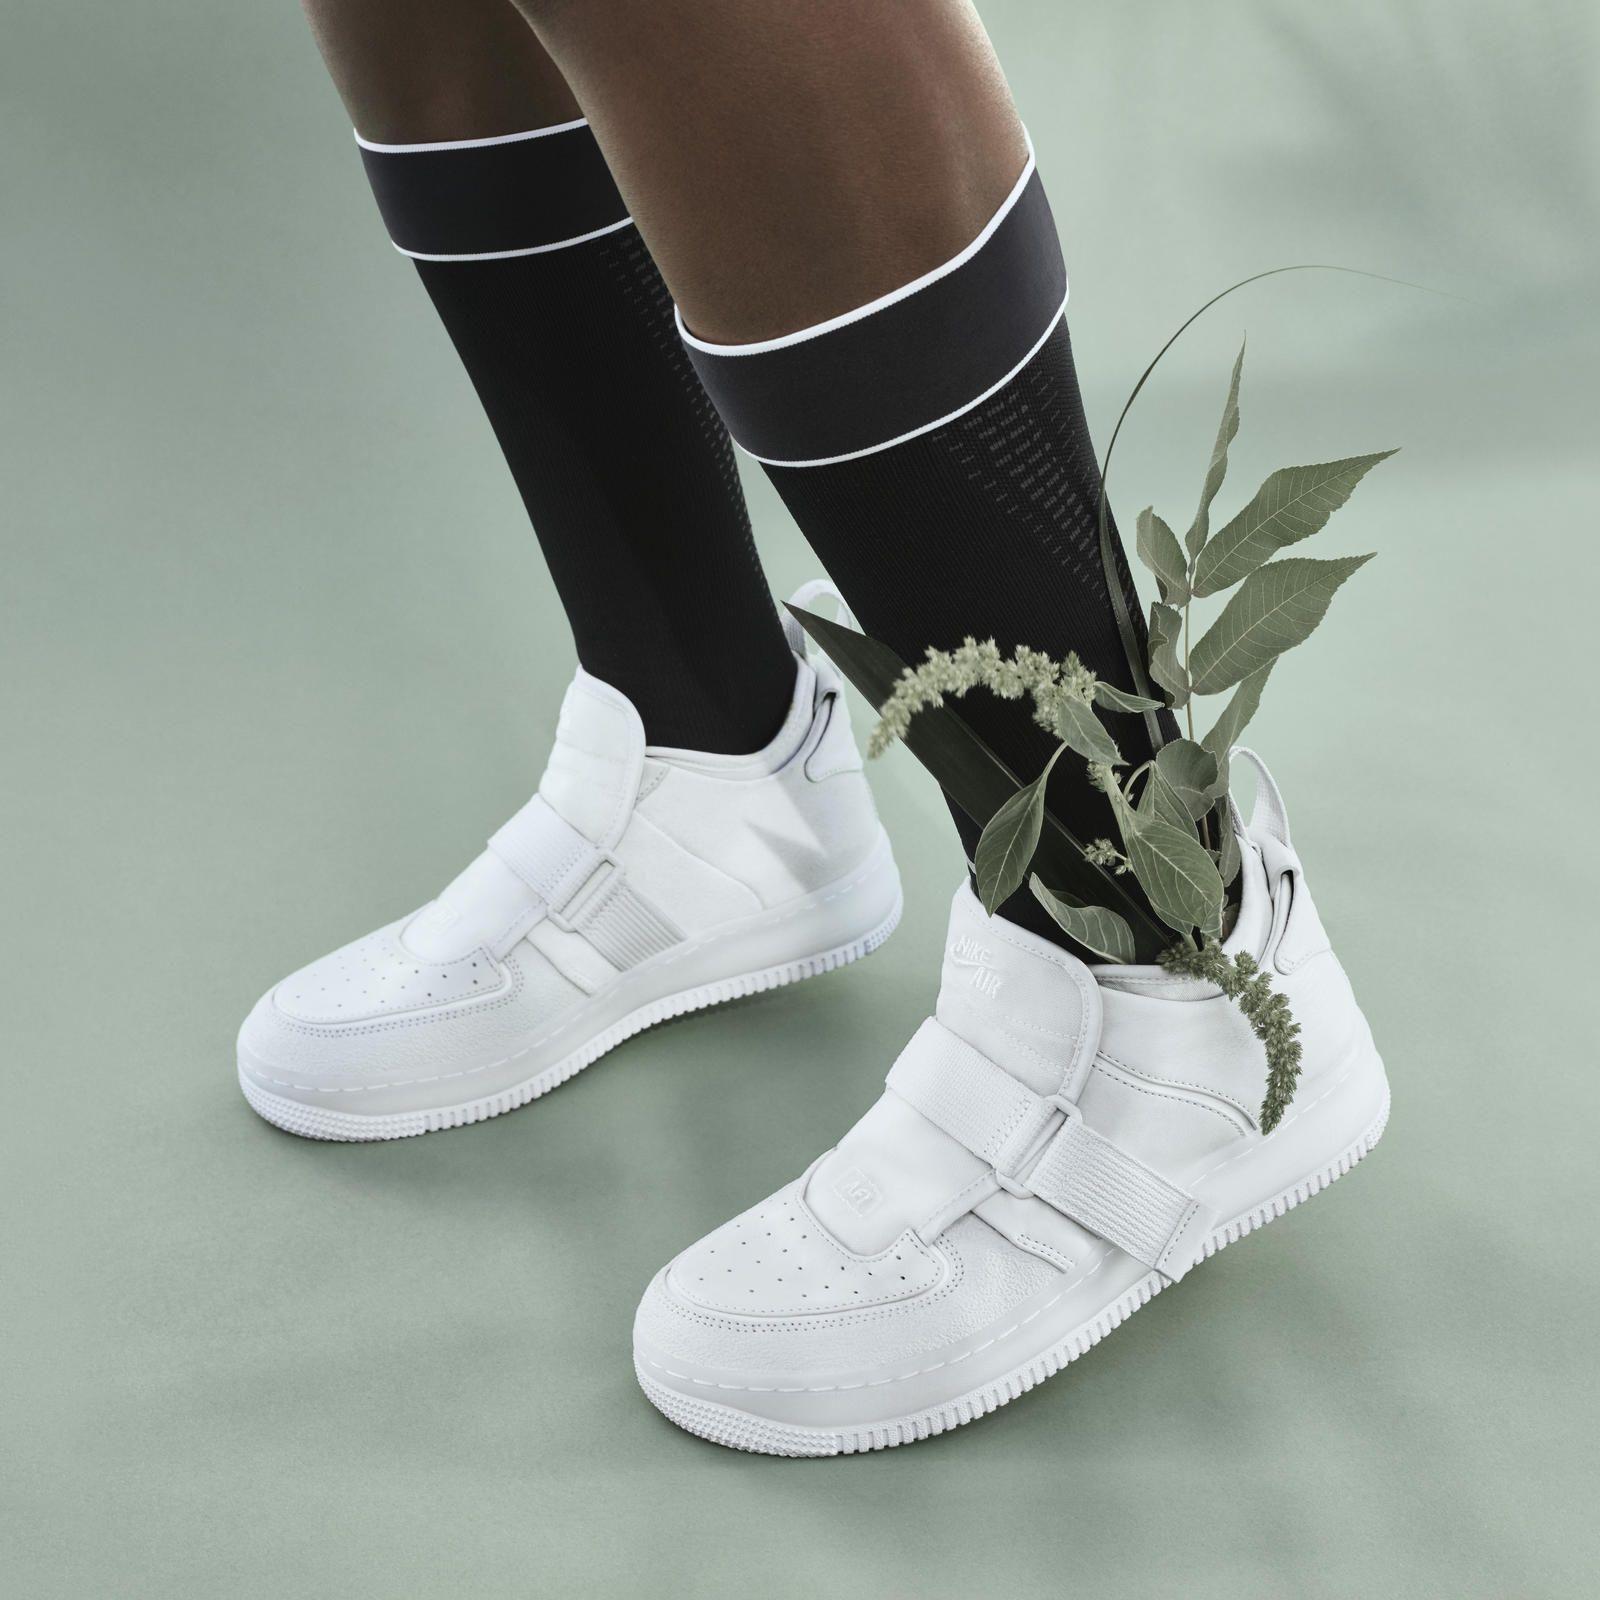 c87258df6d17eb The Nike 1 Reimagined  Air Force 1 Womens and Air Jordan 1 Womens - Nike